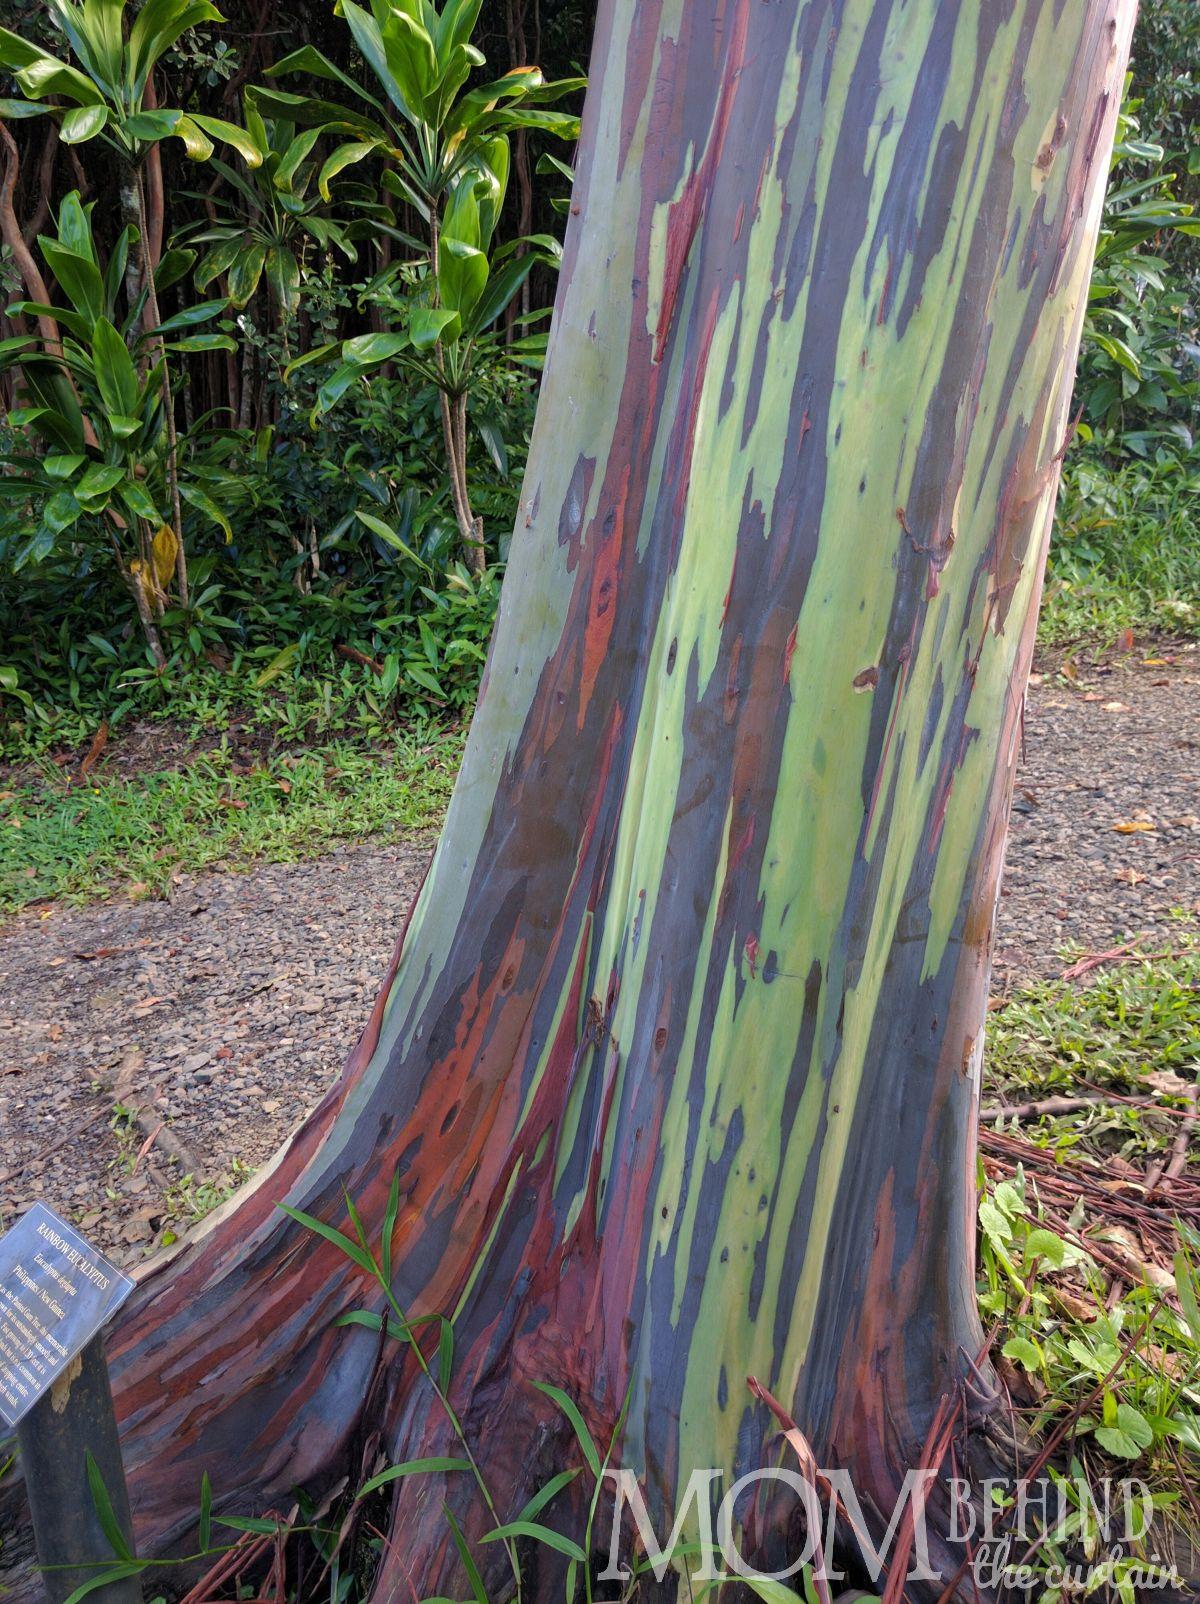 Rainbow eucalyptus tree labelled in Maui's Garden of Eden.